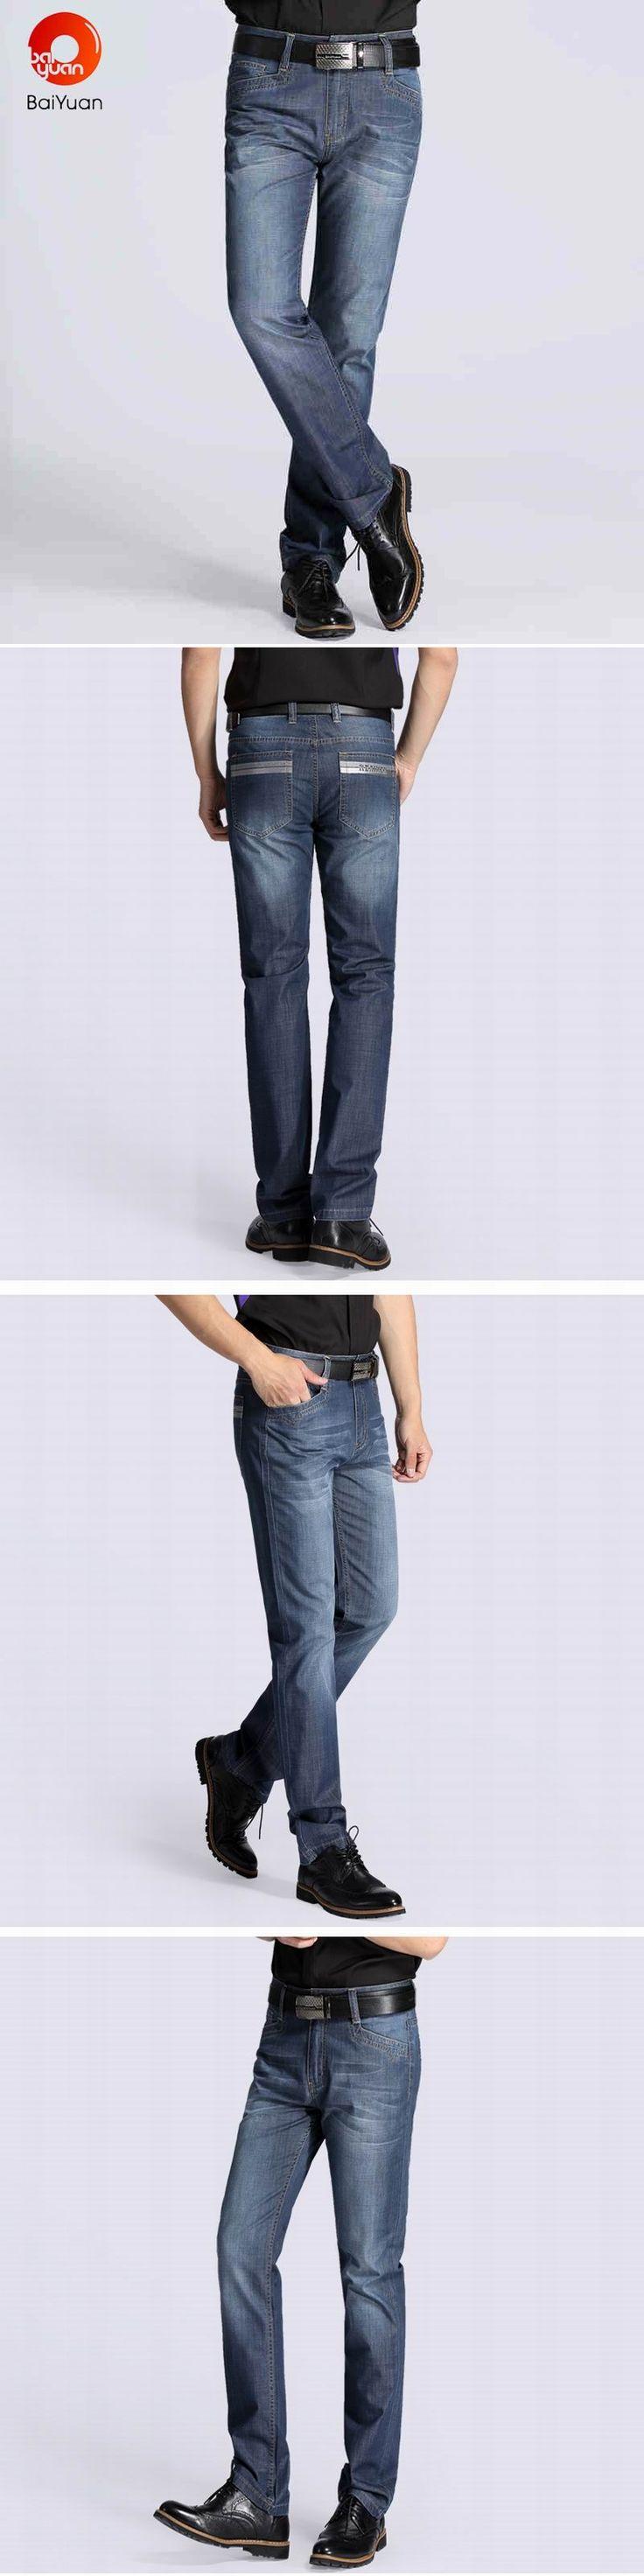 BaiYuan Trousers  Summer Stretch Breathable Straight Fit Jeans Men Thin Men's Denim Jeans Long Pants Lightweight Jeans 3E18D175